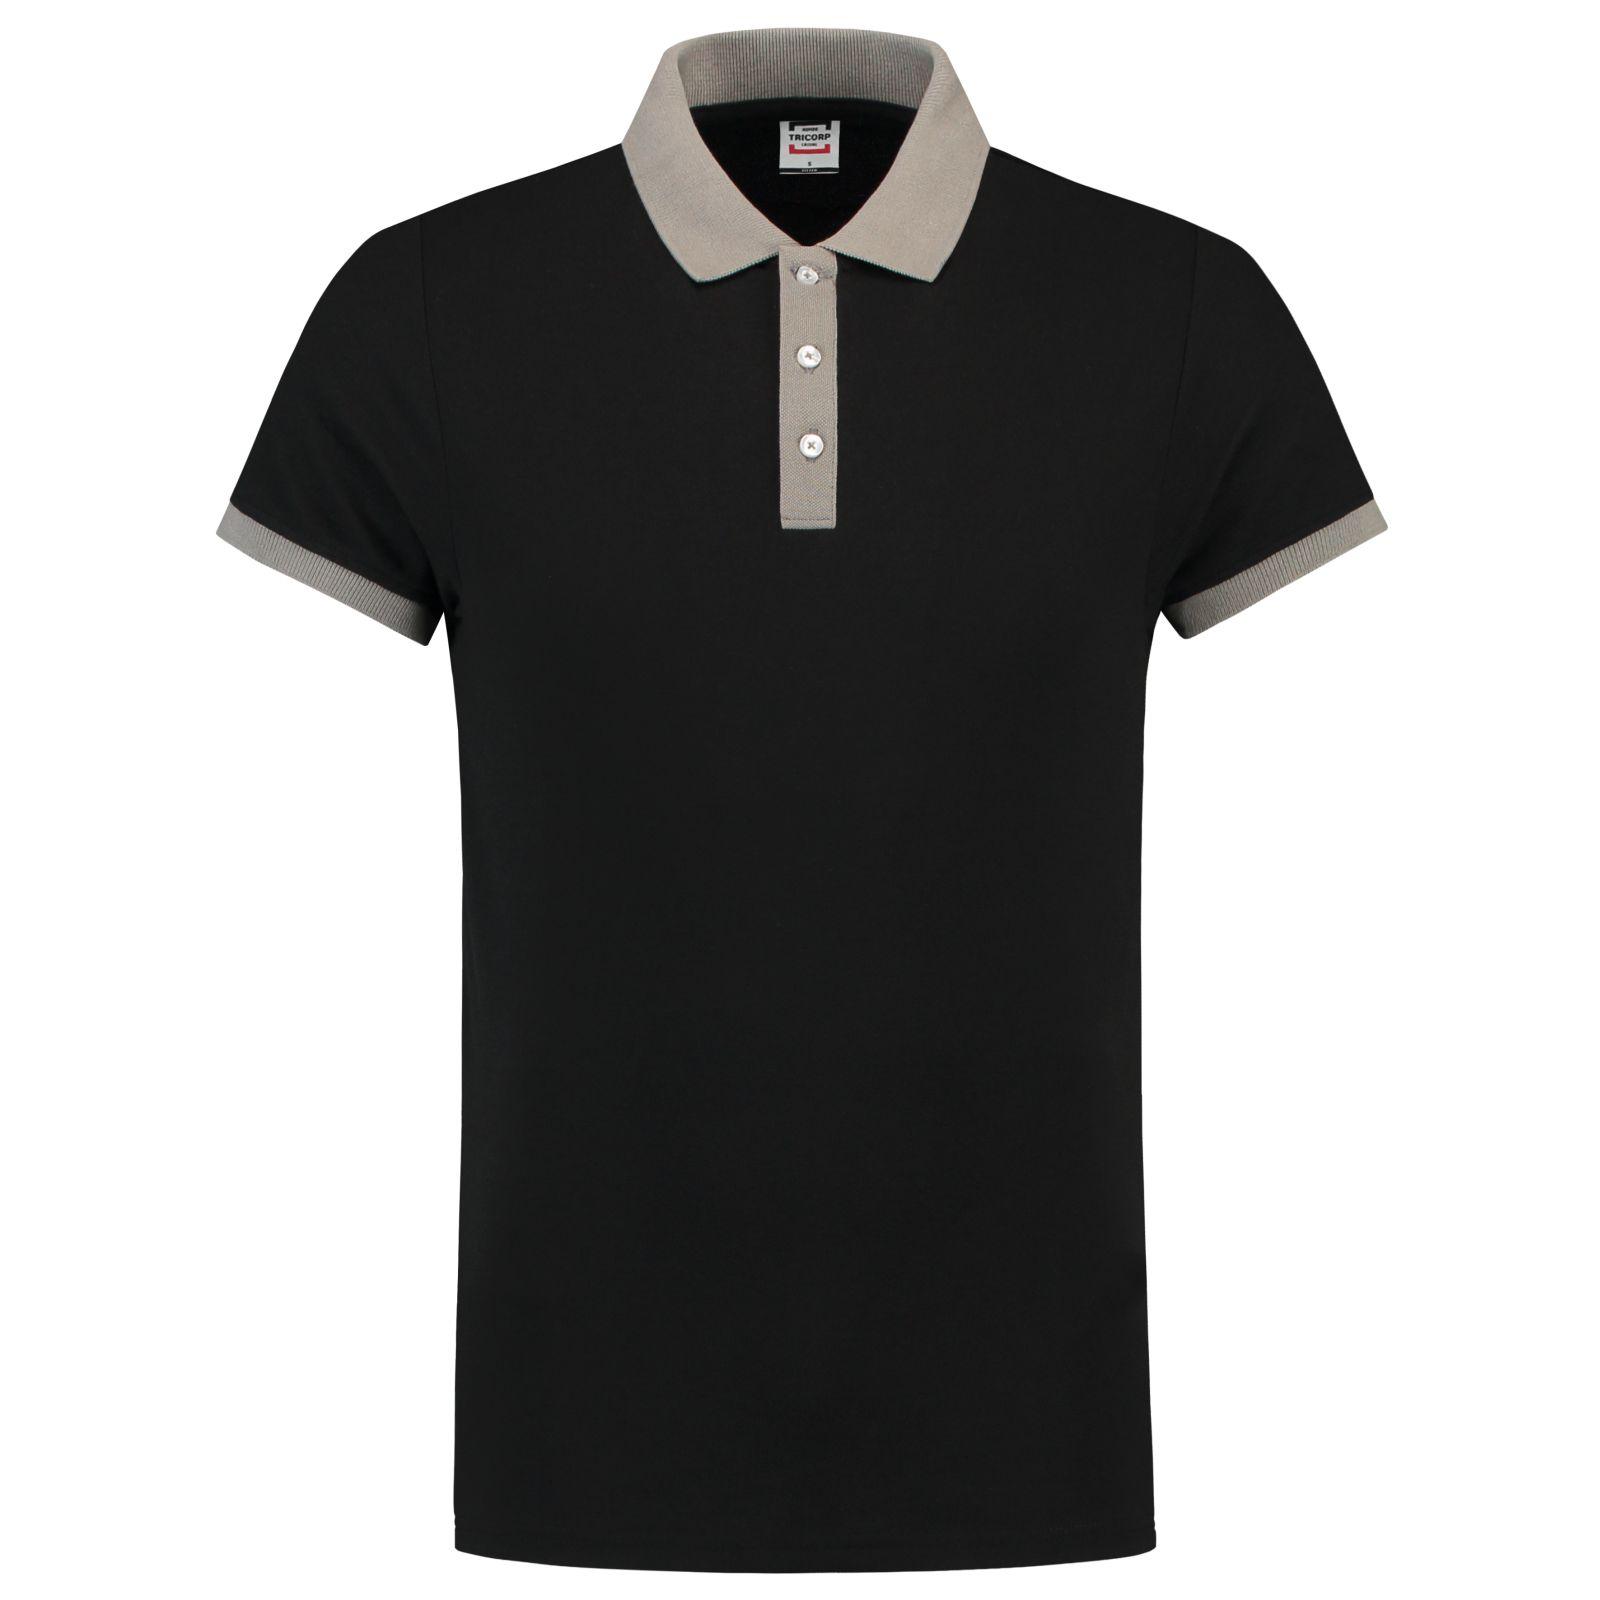 Tricorp Casual Poloshirts 201002-PBF210 zwart-grijs(BlackGrey)